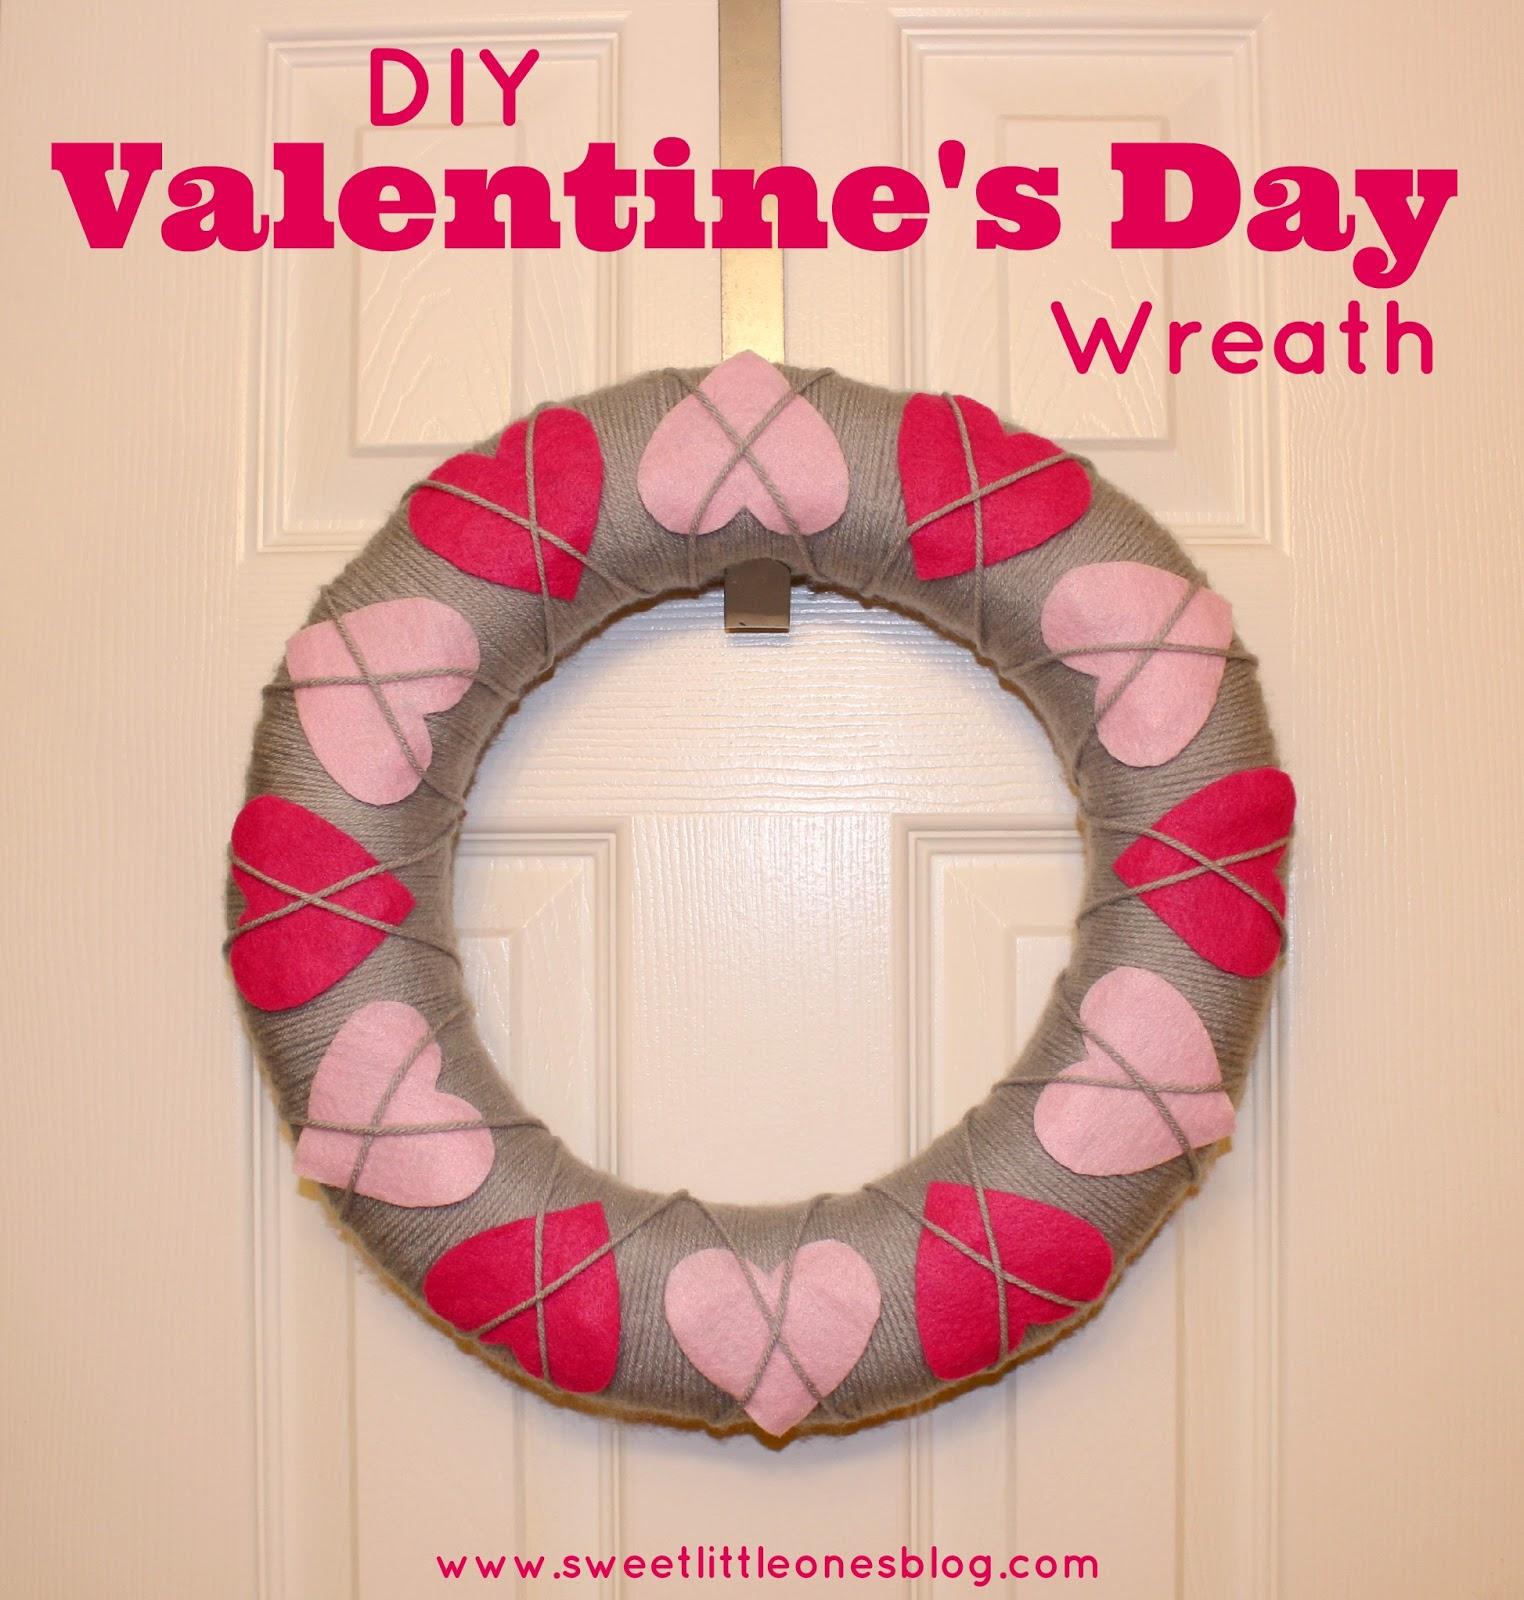 Easy DIY Valentine's Wreath - www.sweetlittleonesblog.com